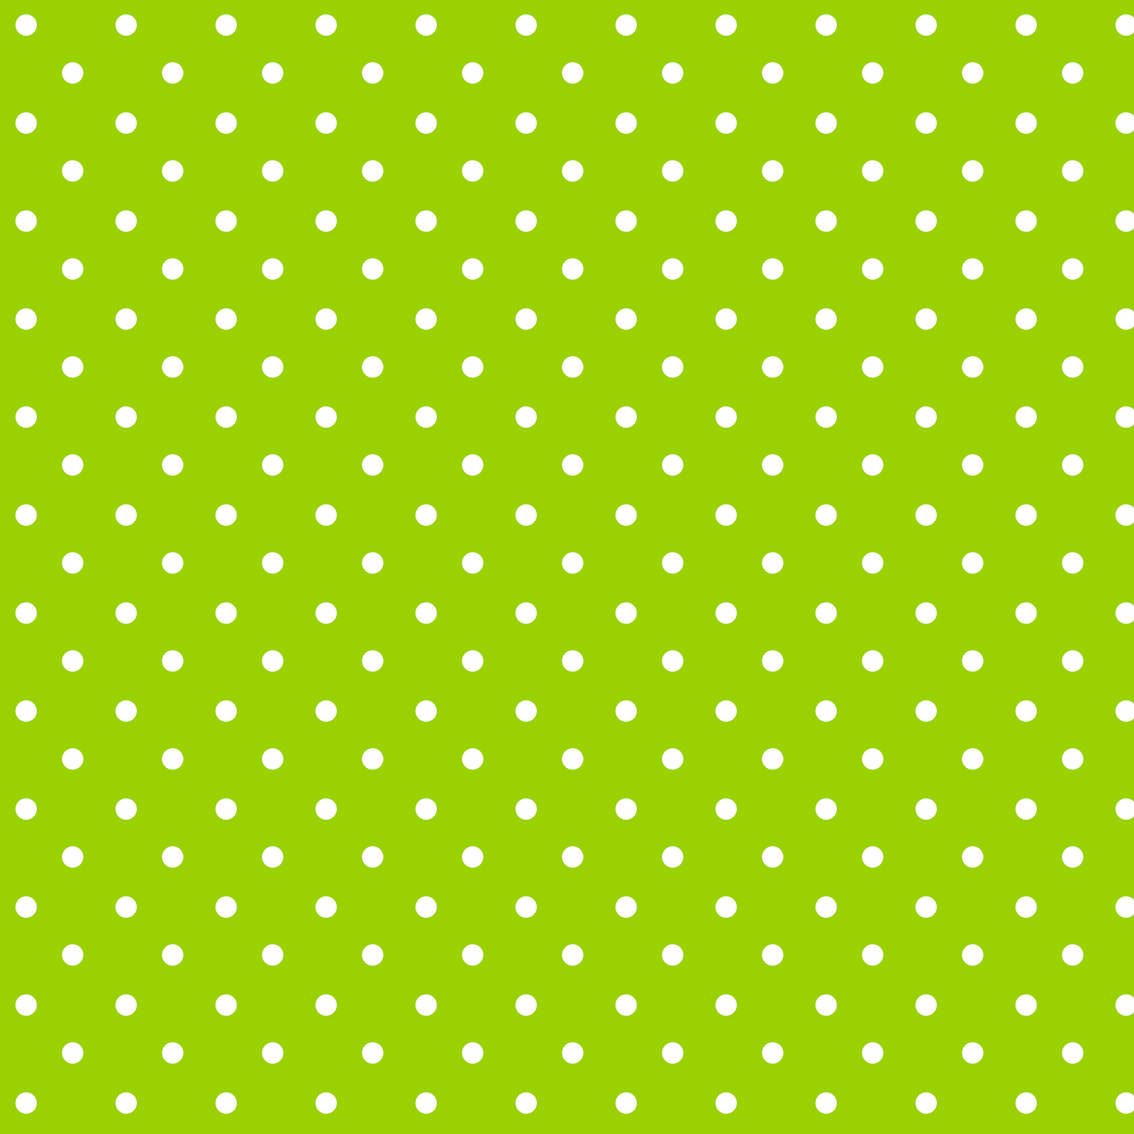 pattern gold yellow polka dot background stock illustration